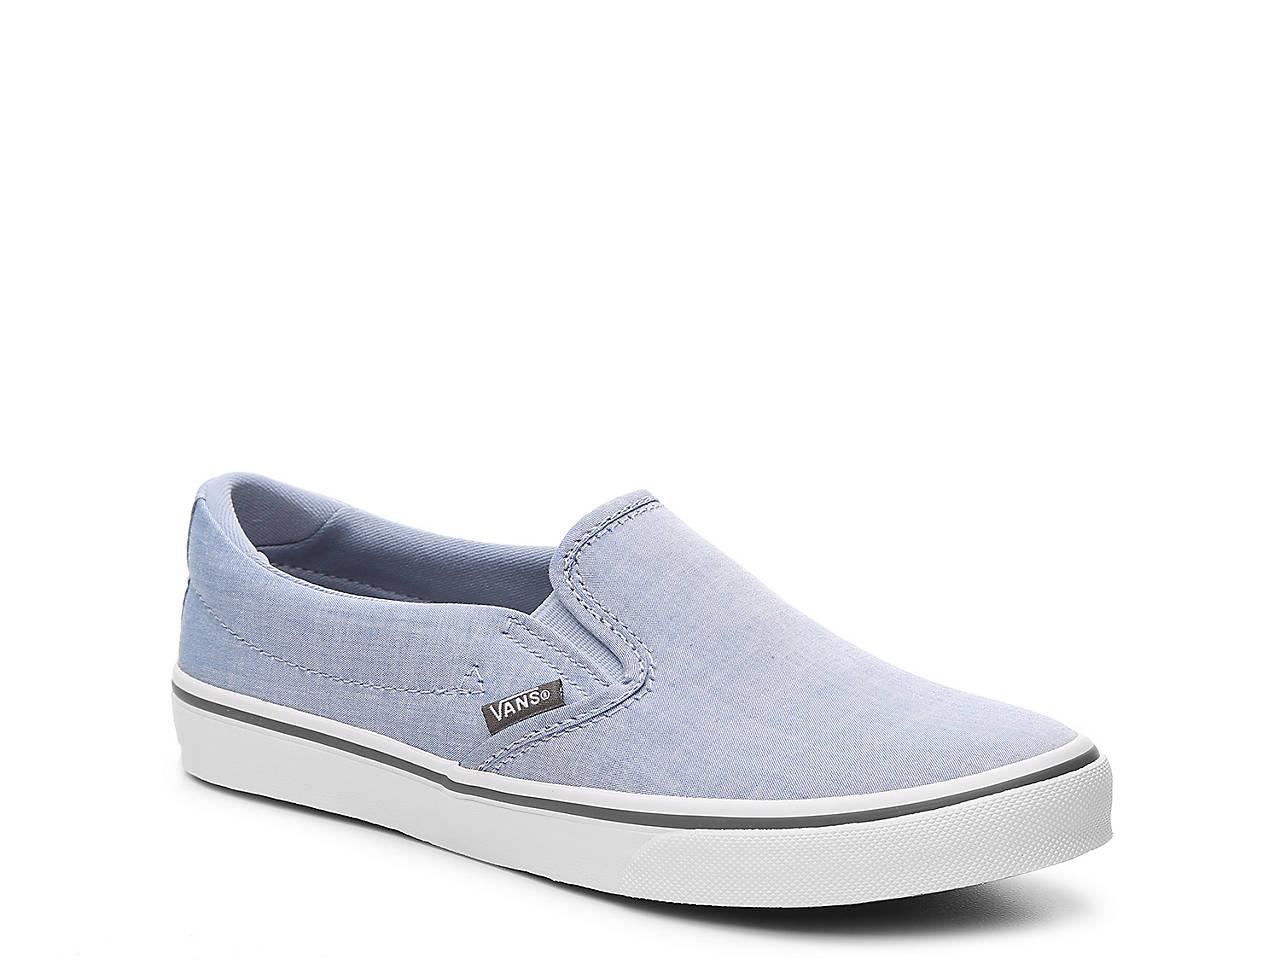 Linen Slip-On Sneakers Browse Sale Online 2018 Cheap Online VOSyZDX